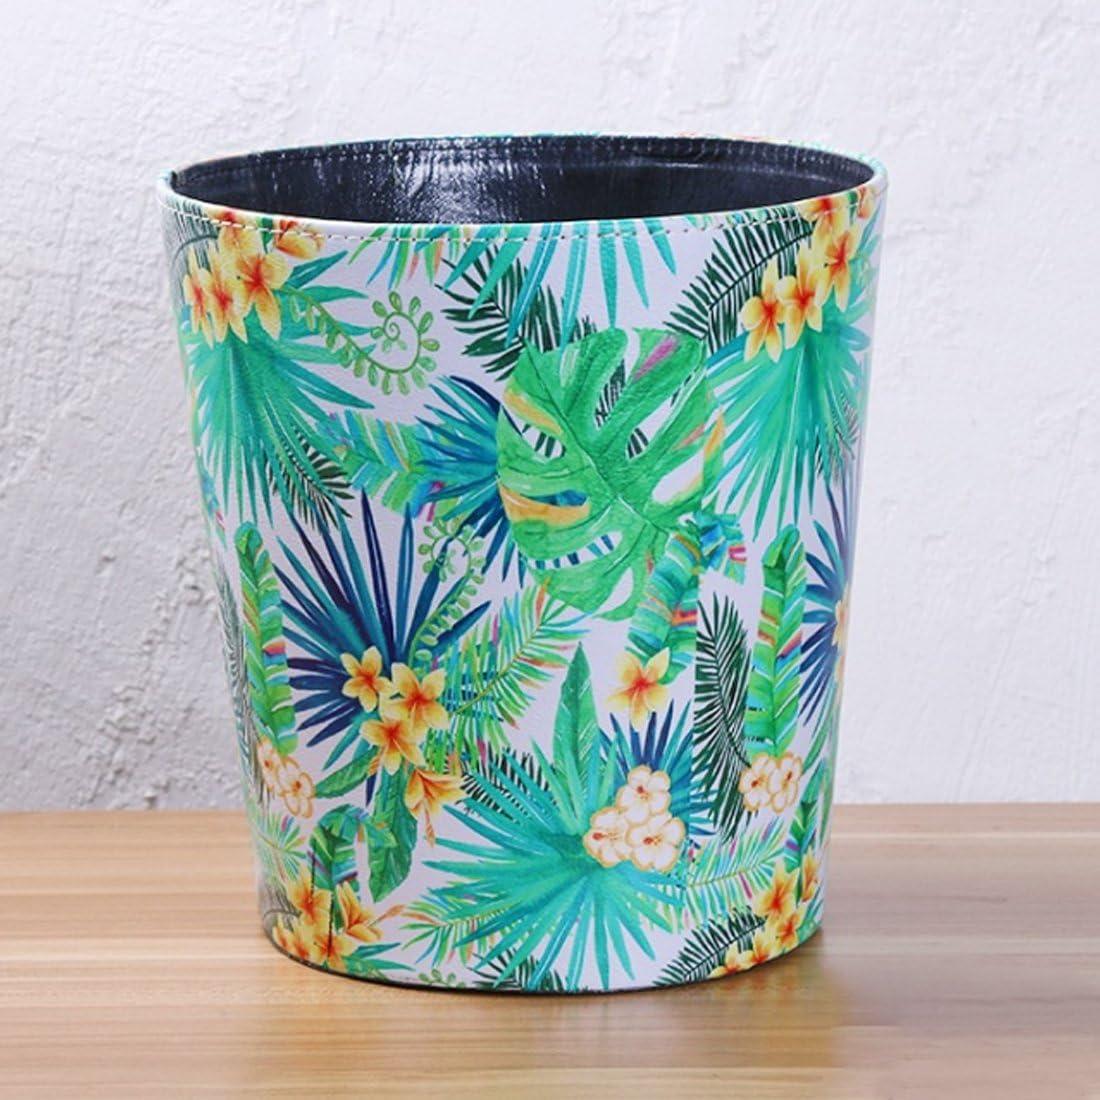 BOROK 10L Waterproof Vintage Office Rubbish Bin Waste Paper Bin Children Hawaiian Typ 2 25 x 27cm 25/x 27/cm PU